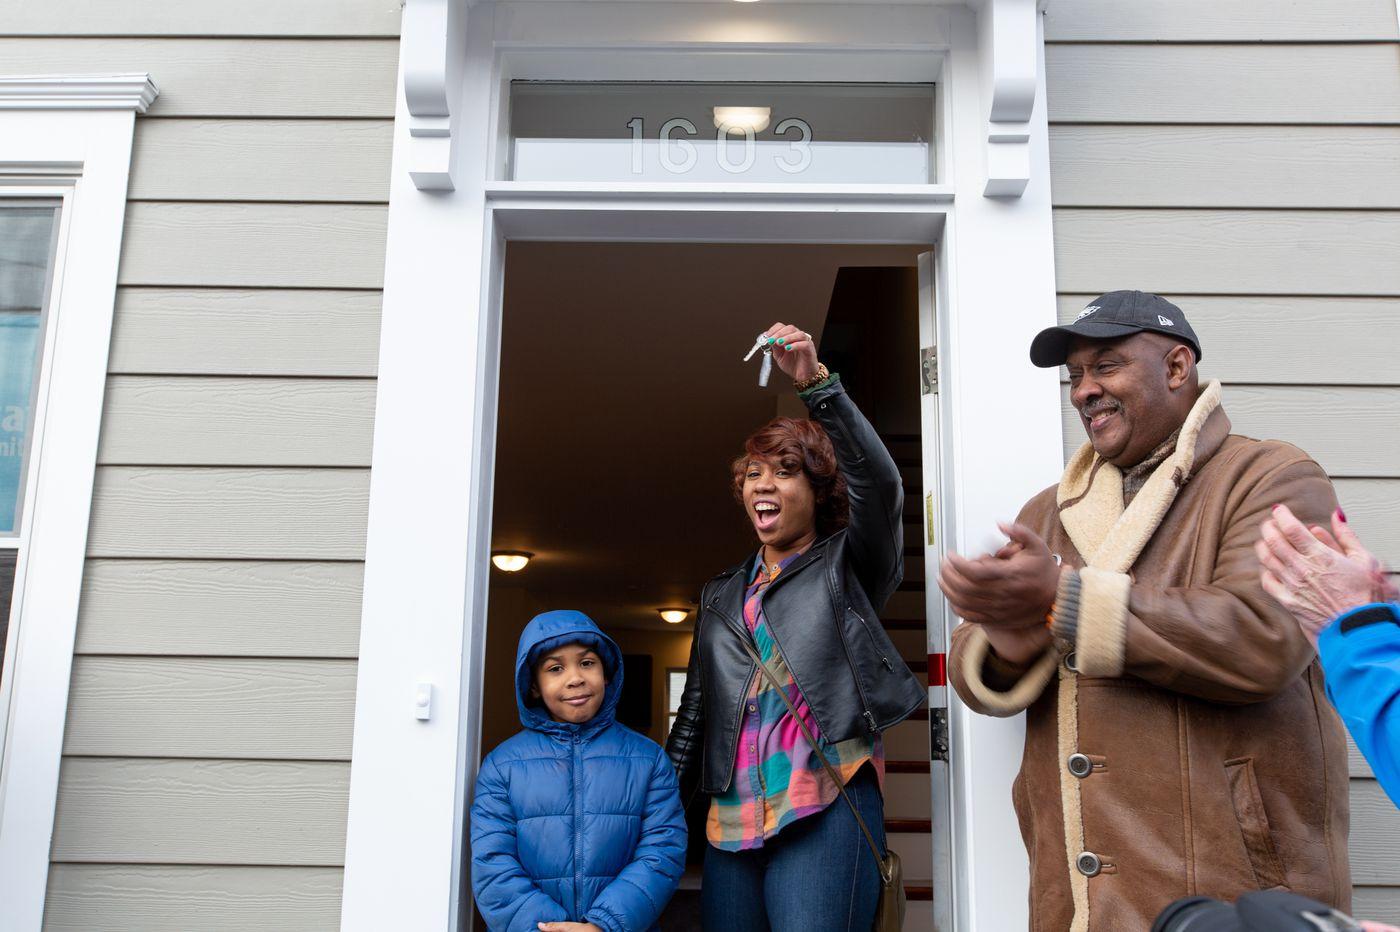 Habitat for Humanity Philadelphia completes Diamond Park development with final home dedication